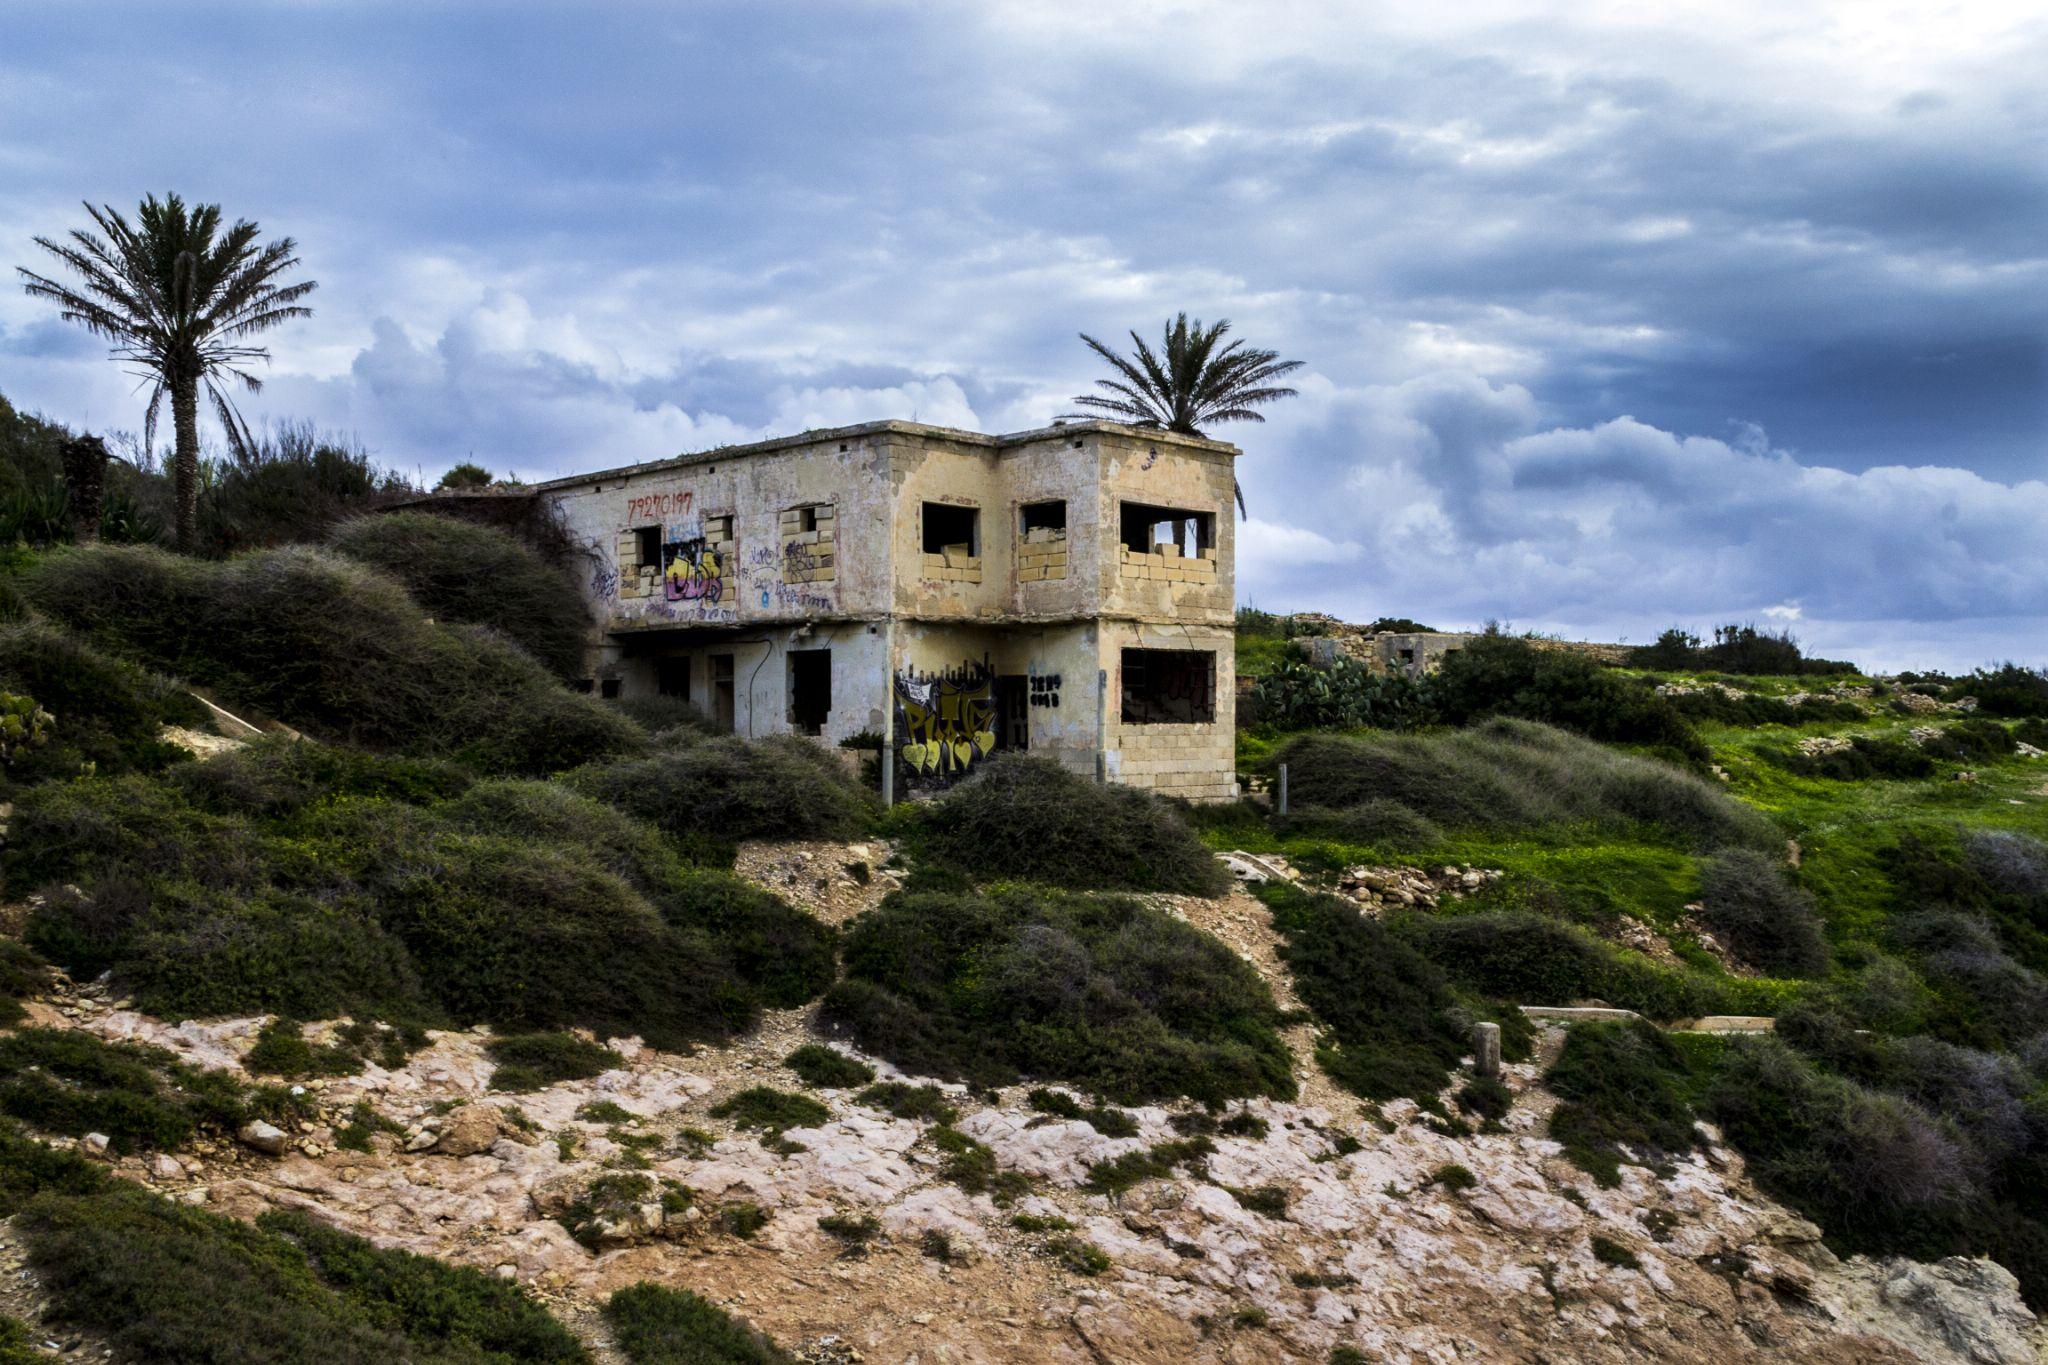 Abandoned by Gareth Schembri